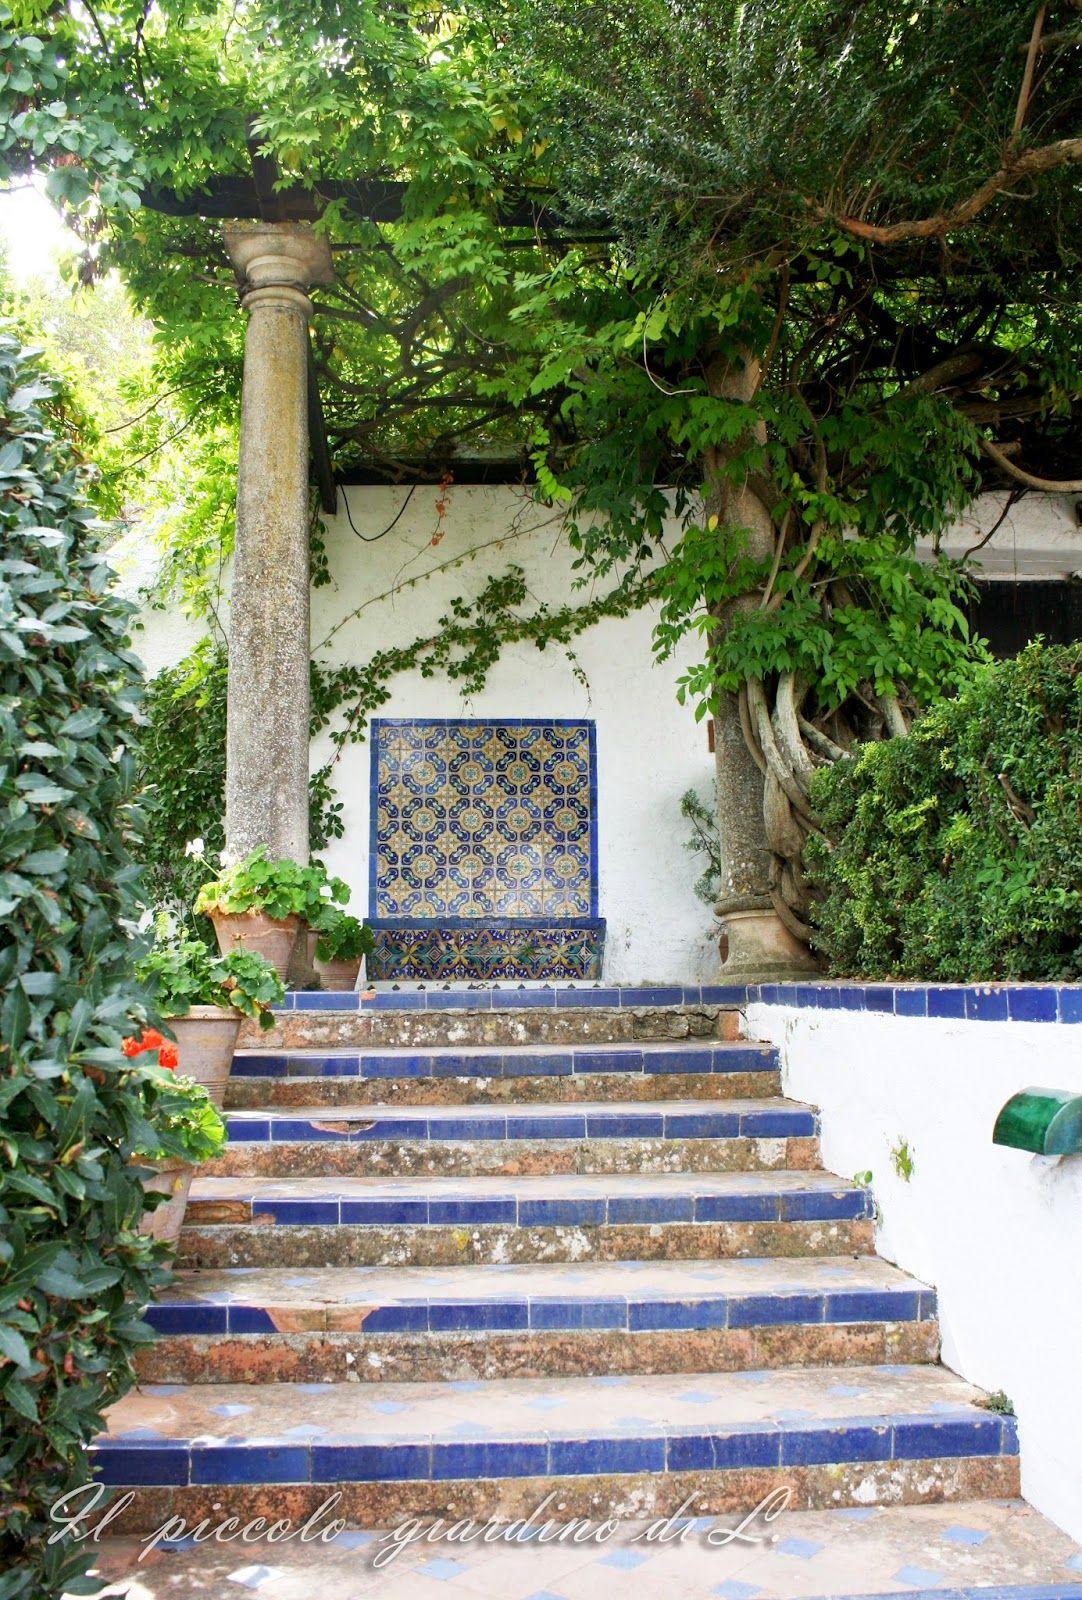 Giardini storici andalusi (Prima parte) i giardini